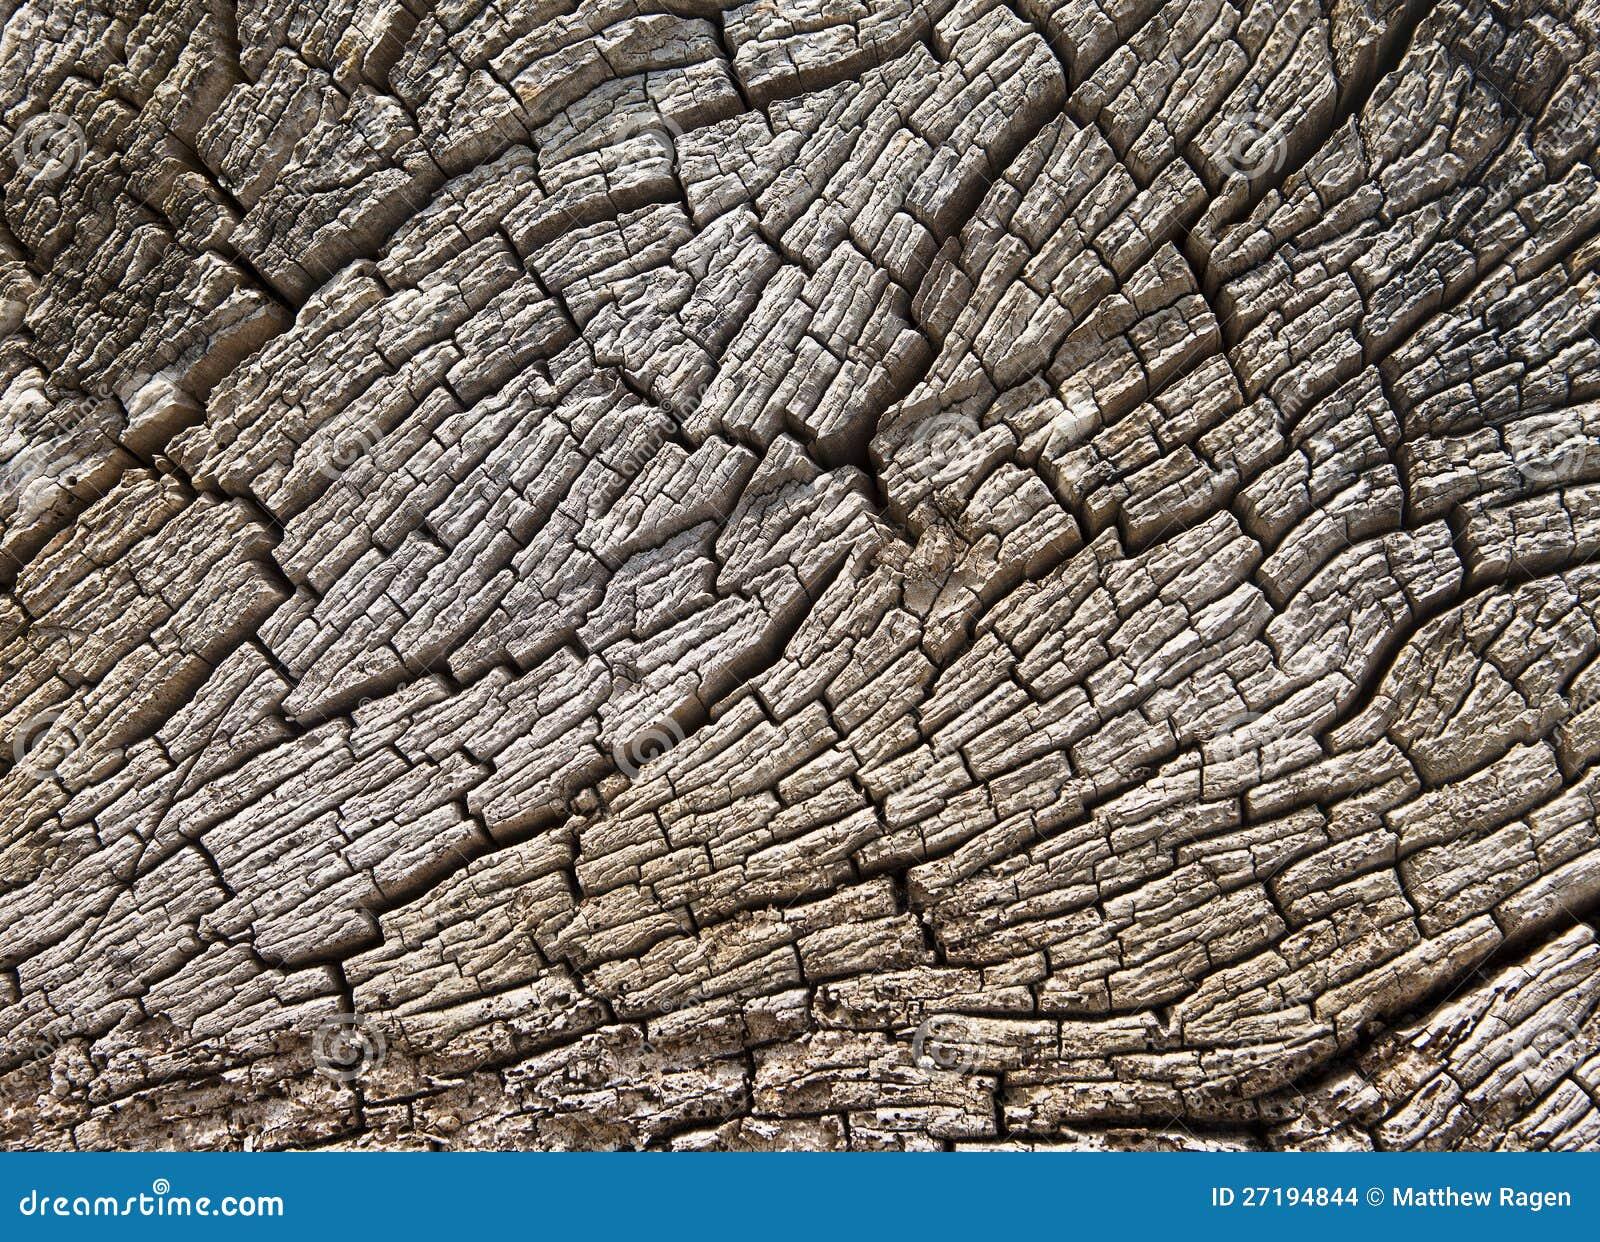 driftwood stump texture stock images